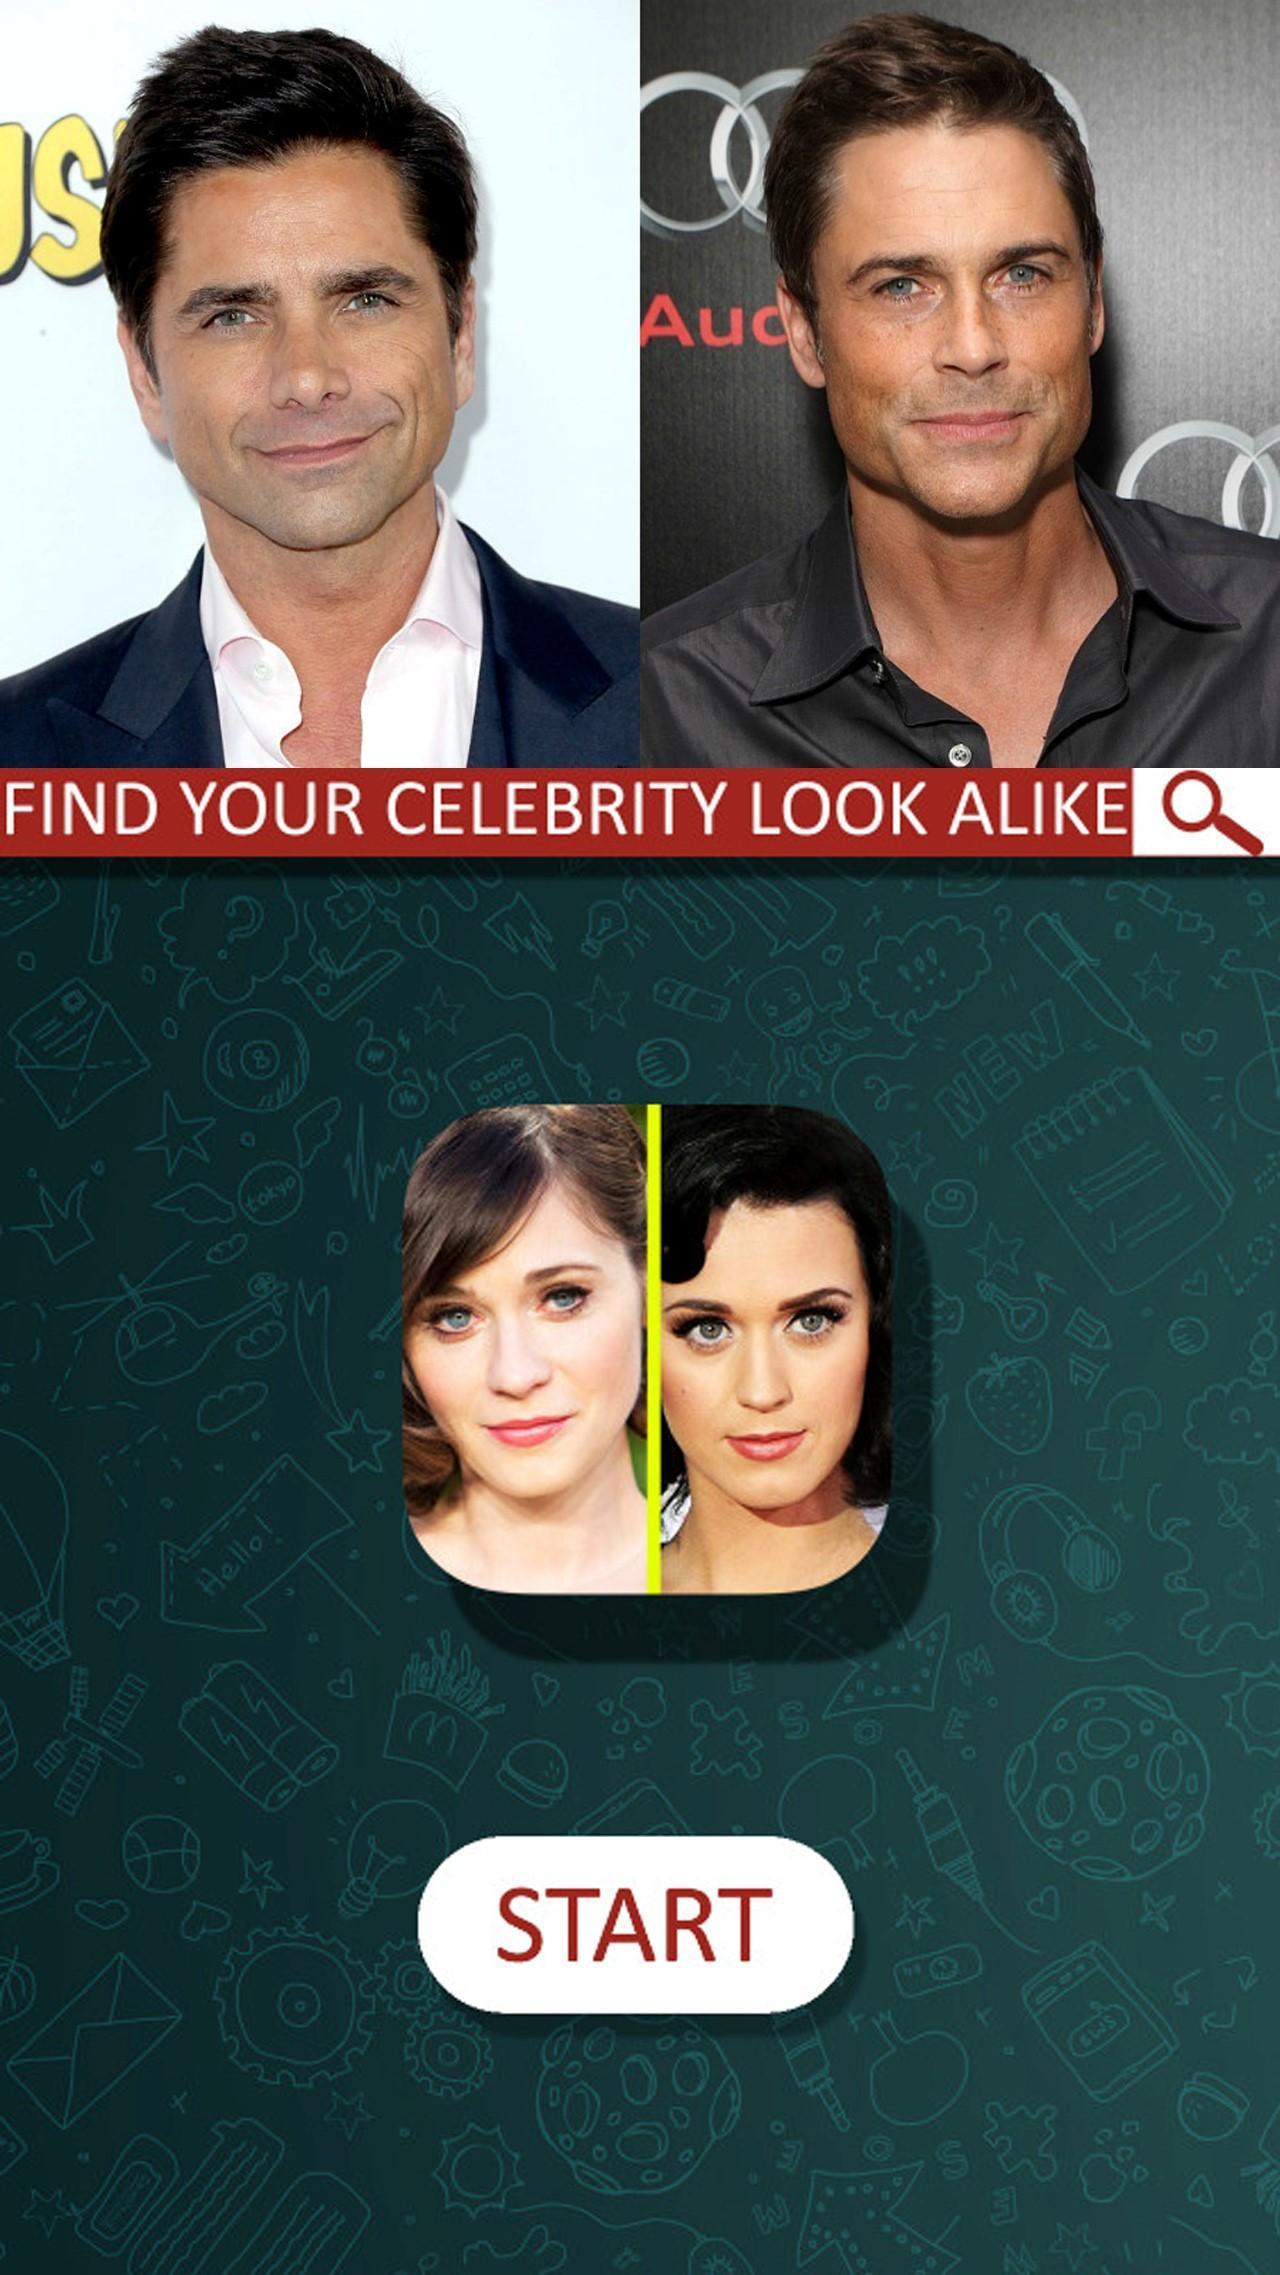 My celebrity look alike